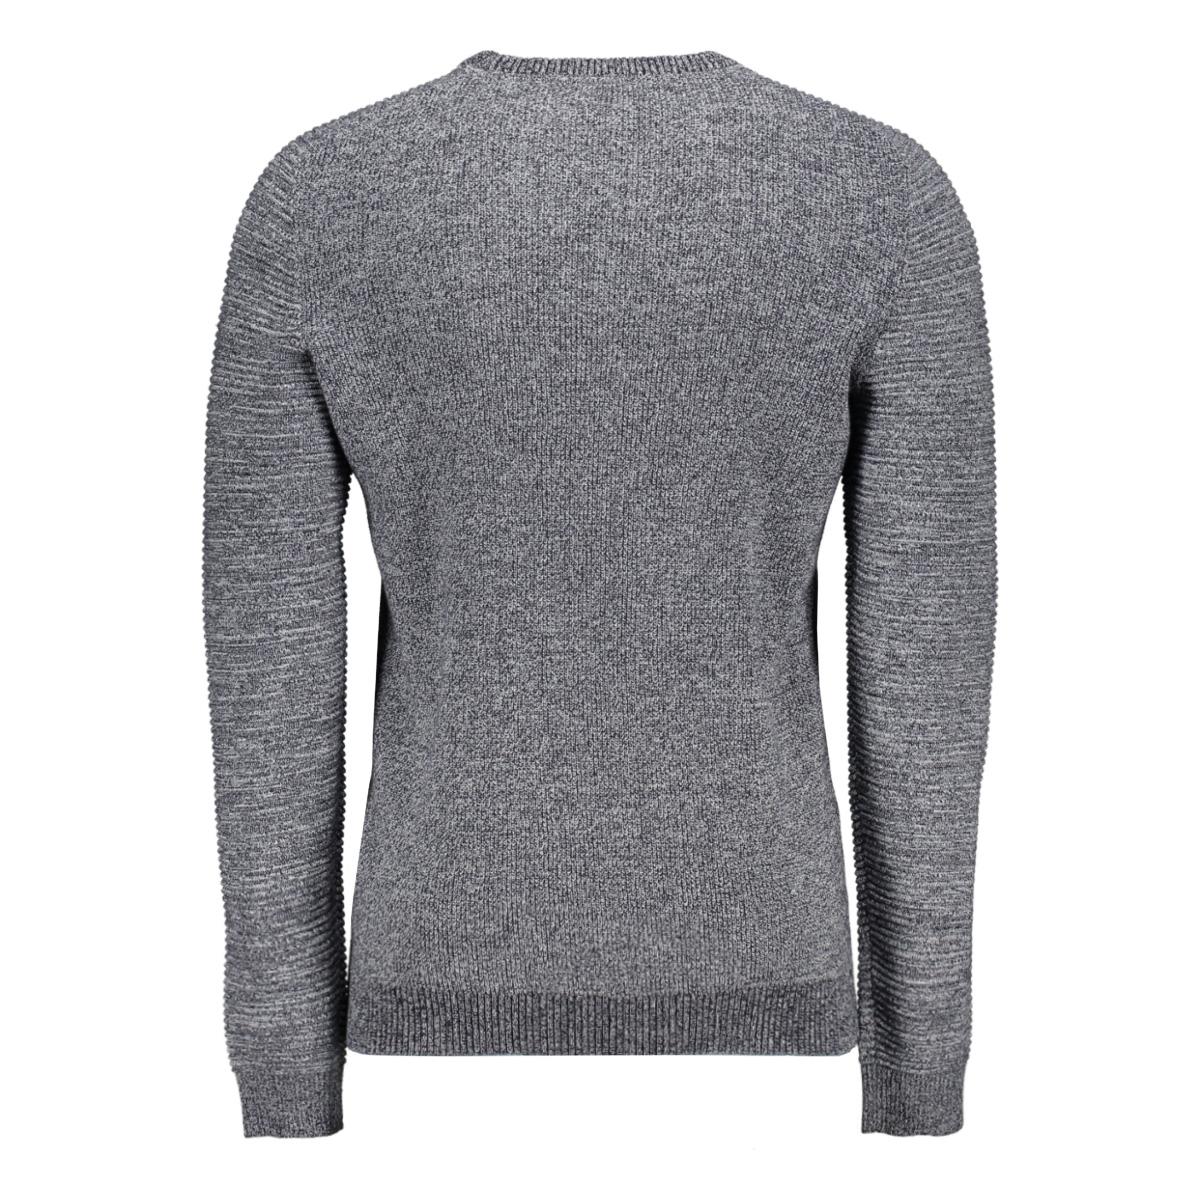 jcoinfinity  knit crew neck 12167761 jack & jones trui white/knit fit